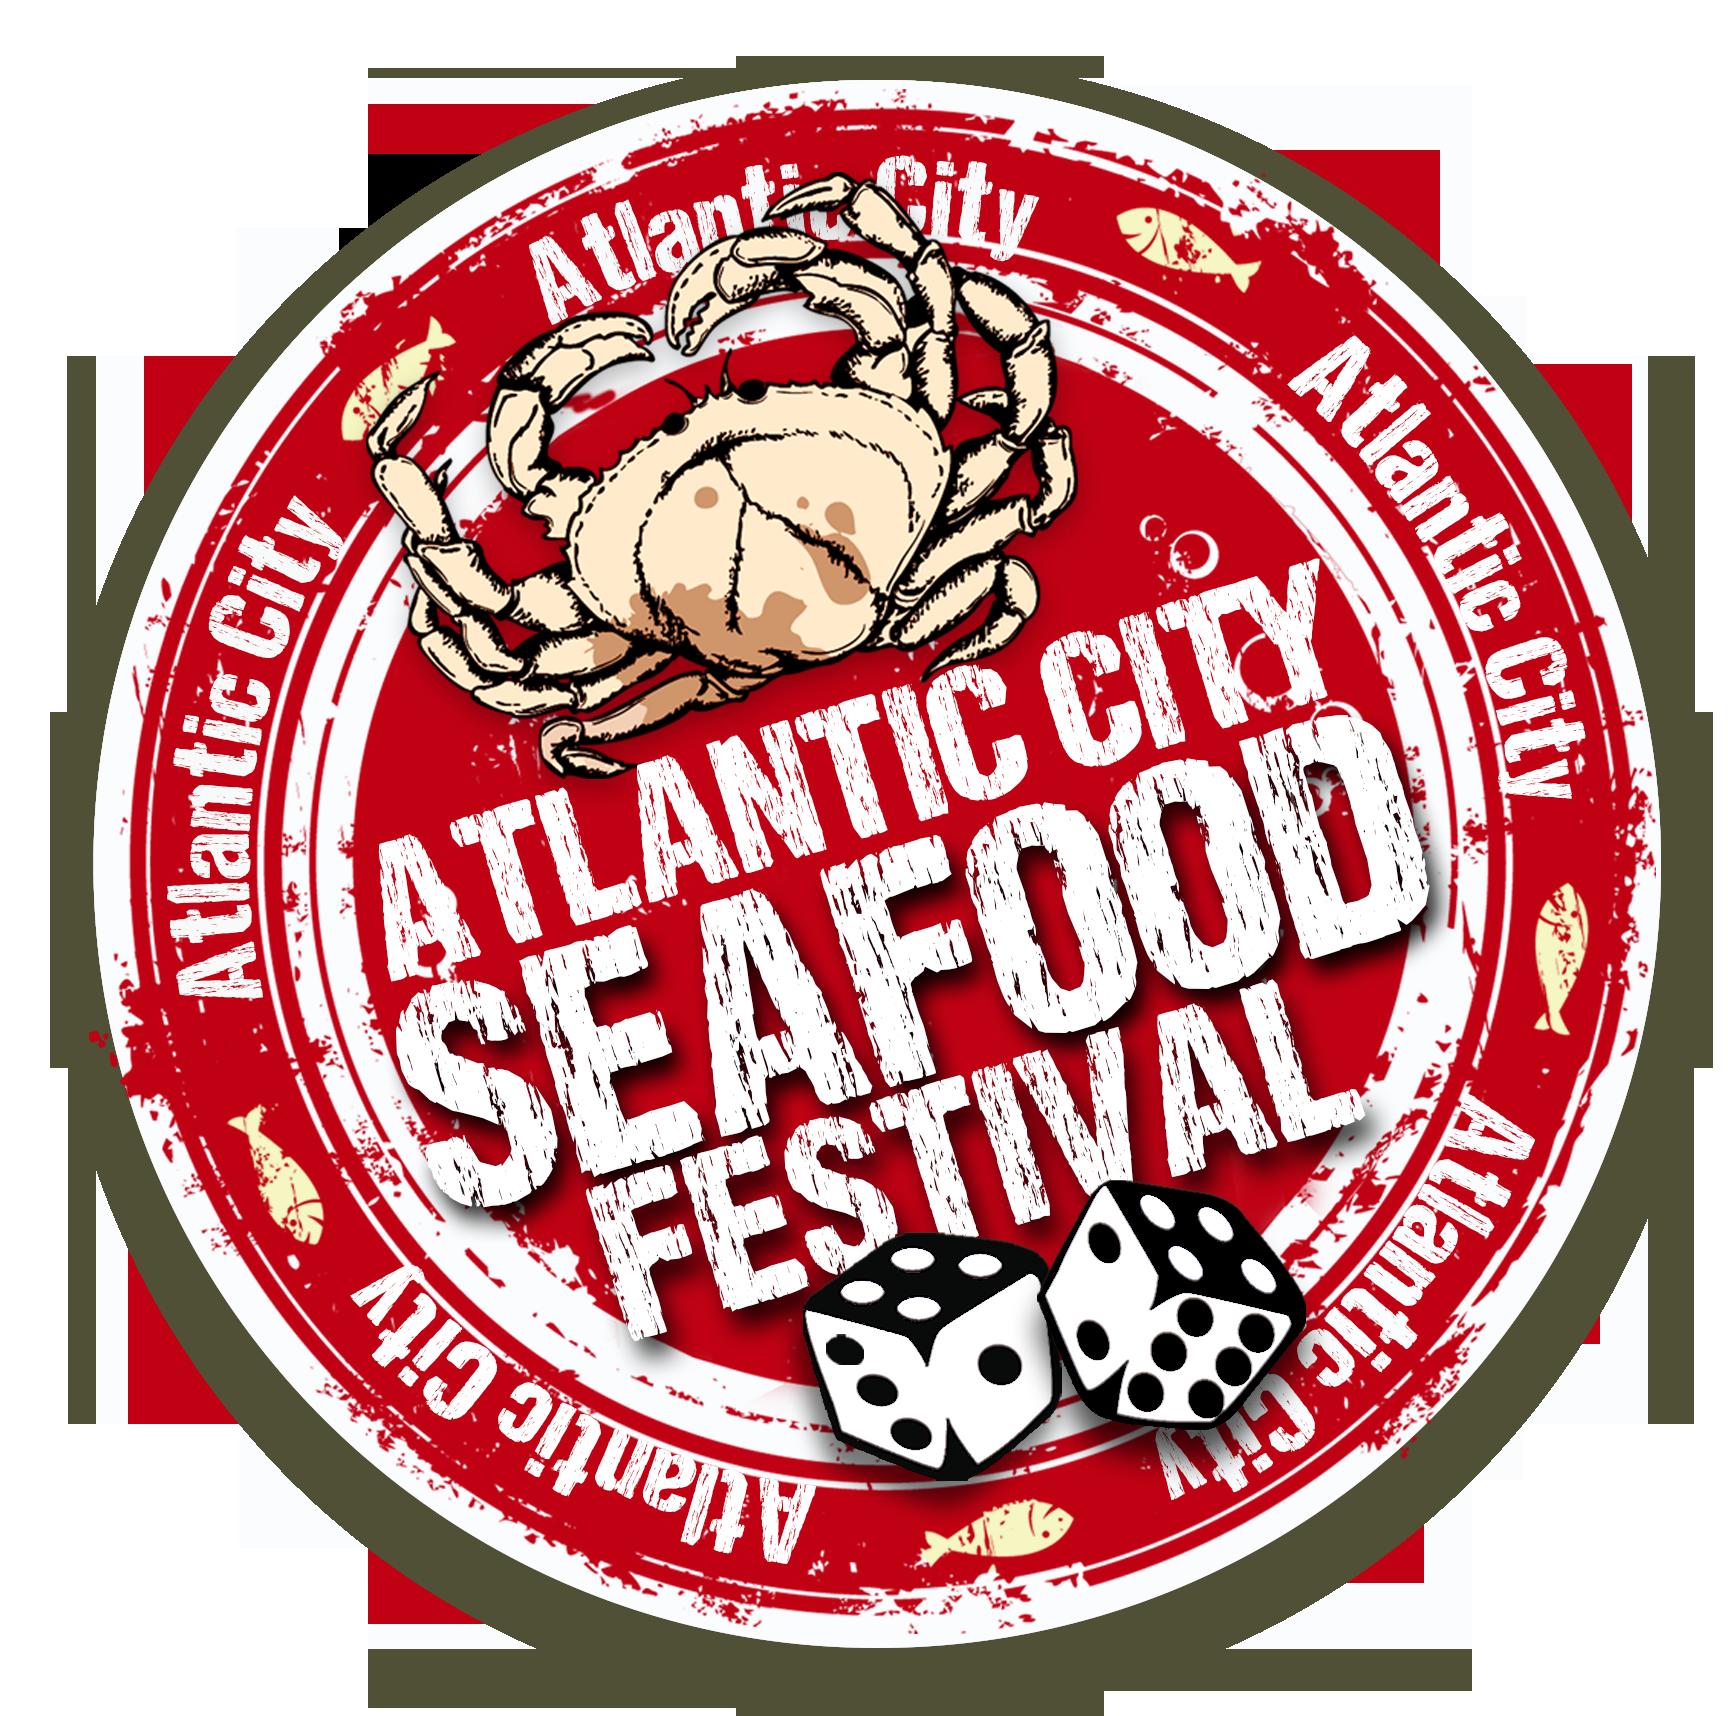 The Atlantic City Seafood Festival